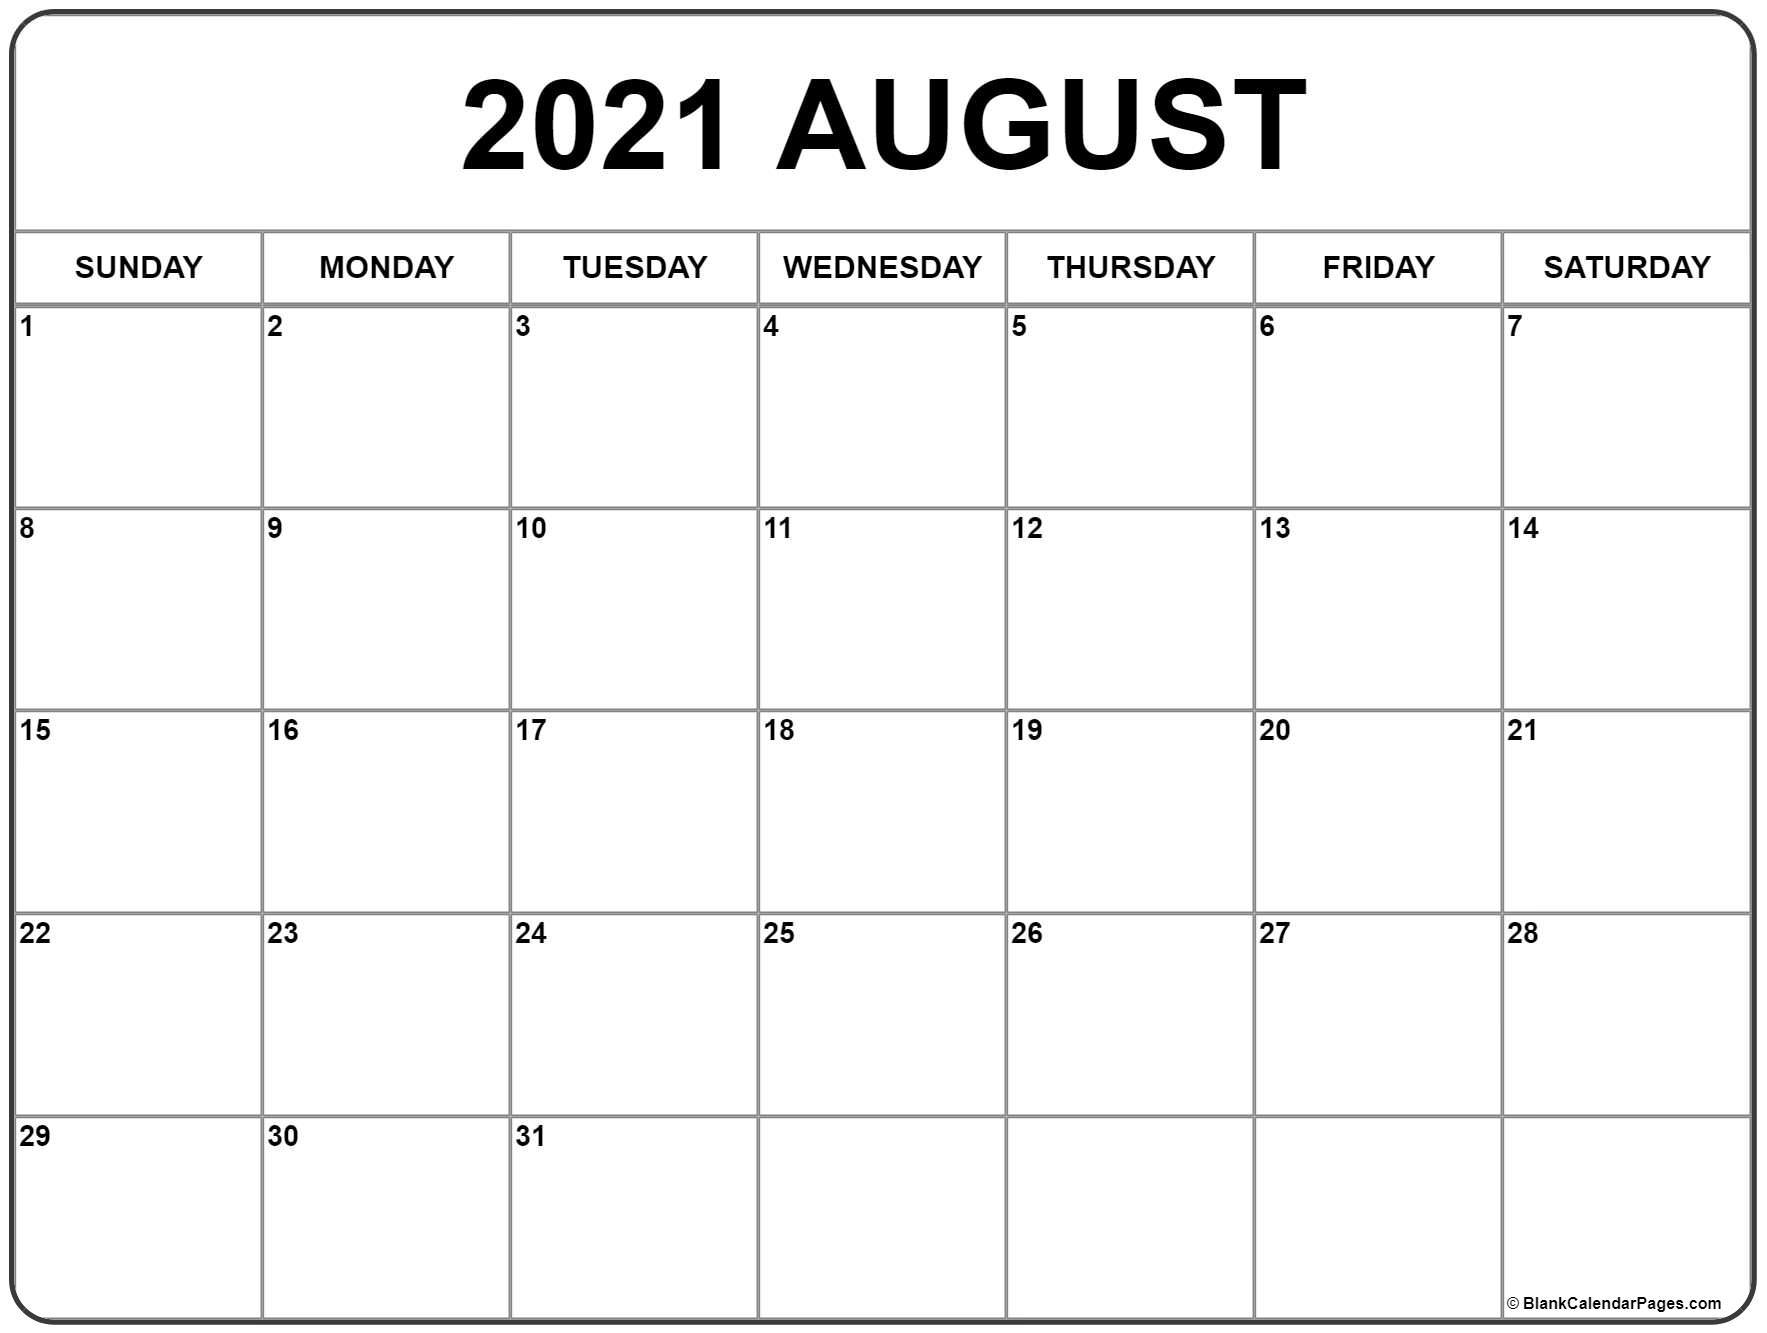 Get Back To School August 2021 Calendar